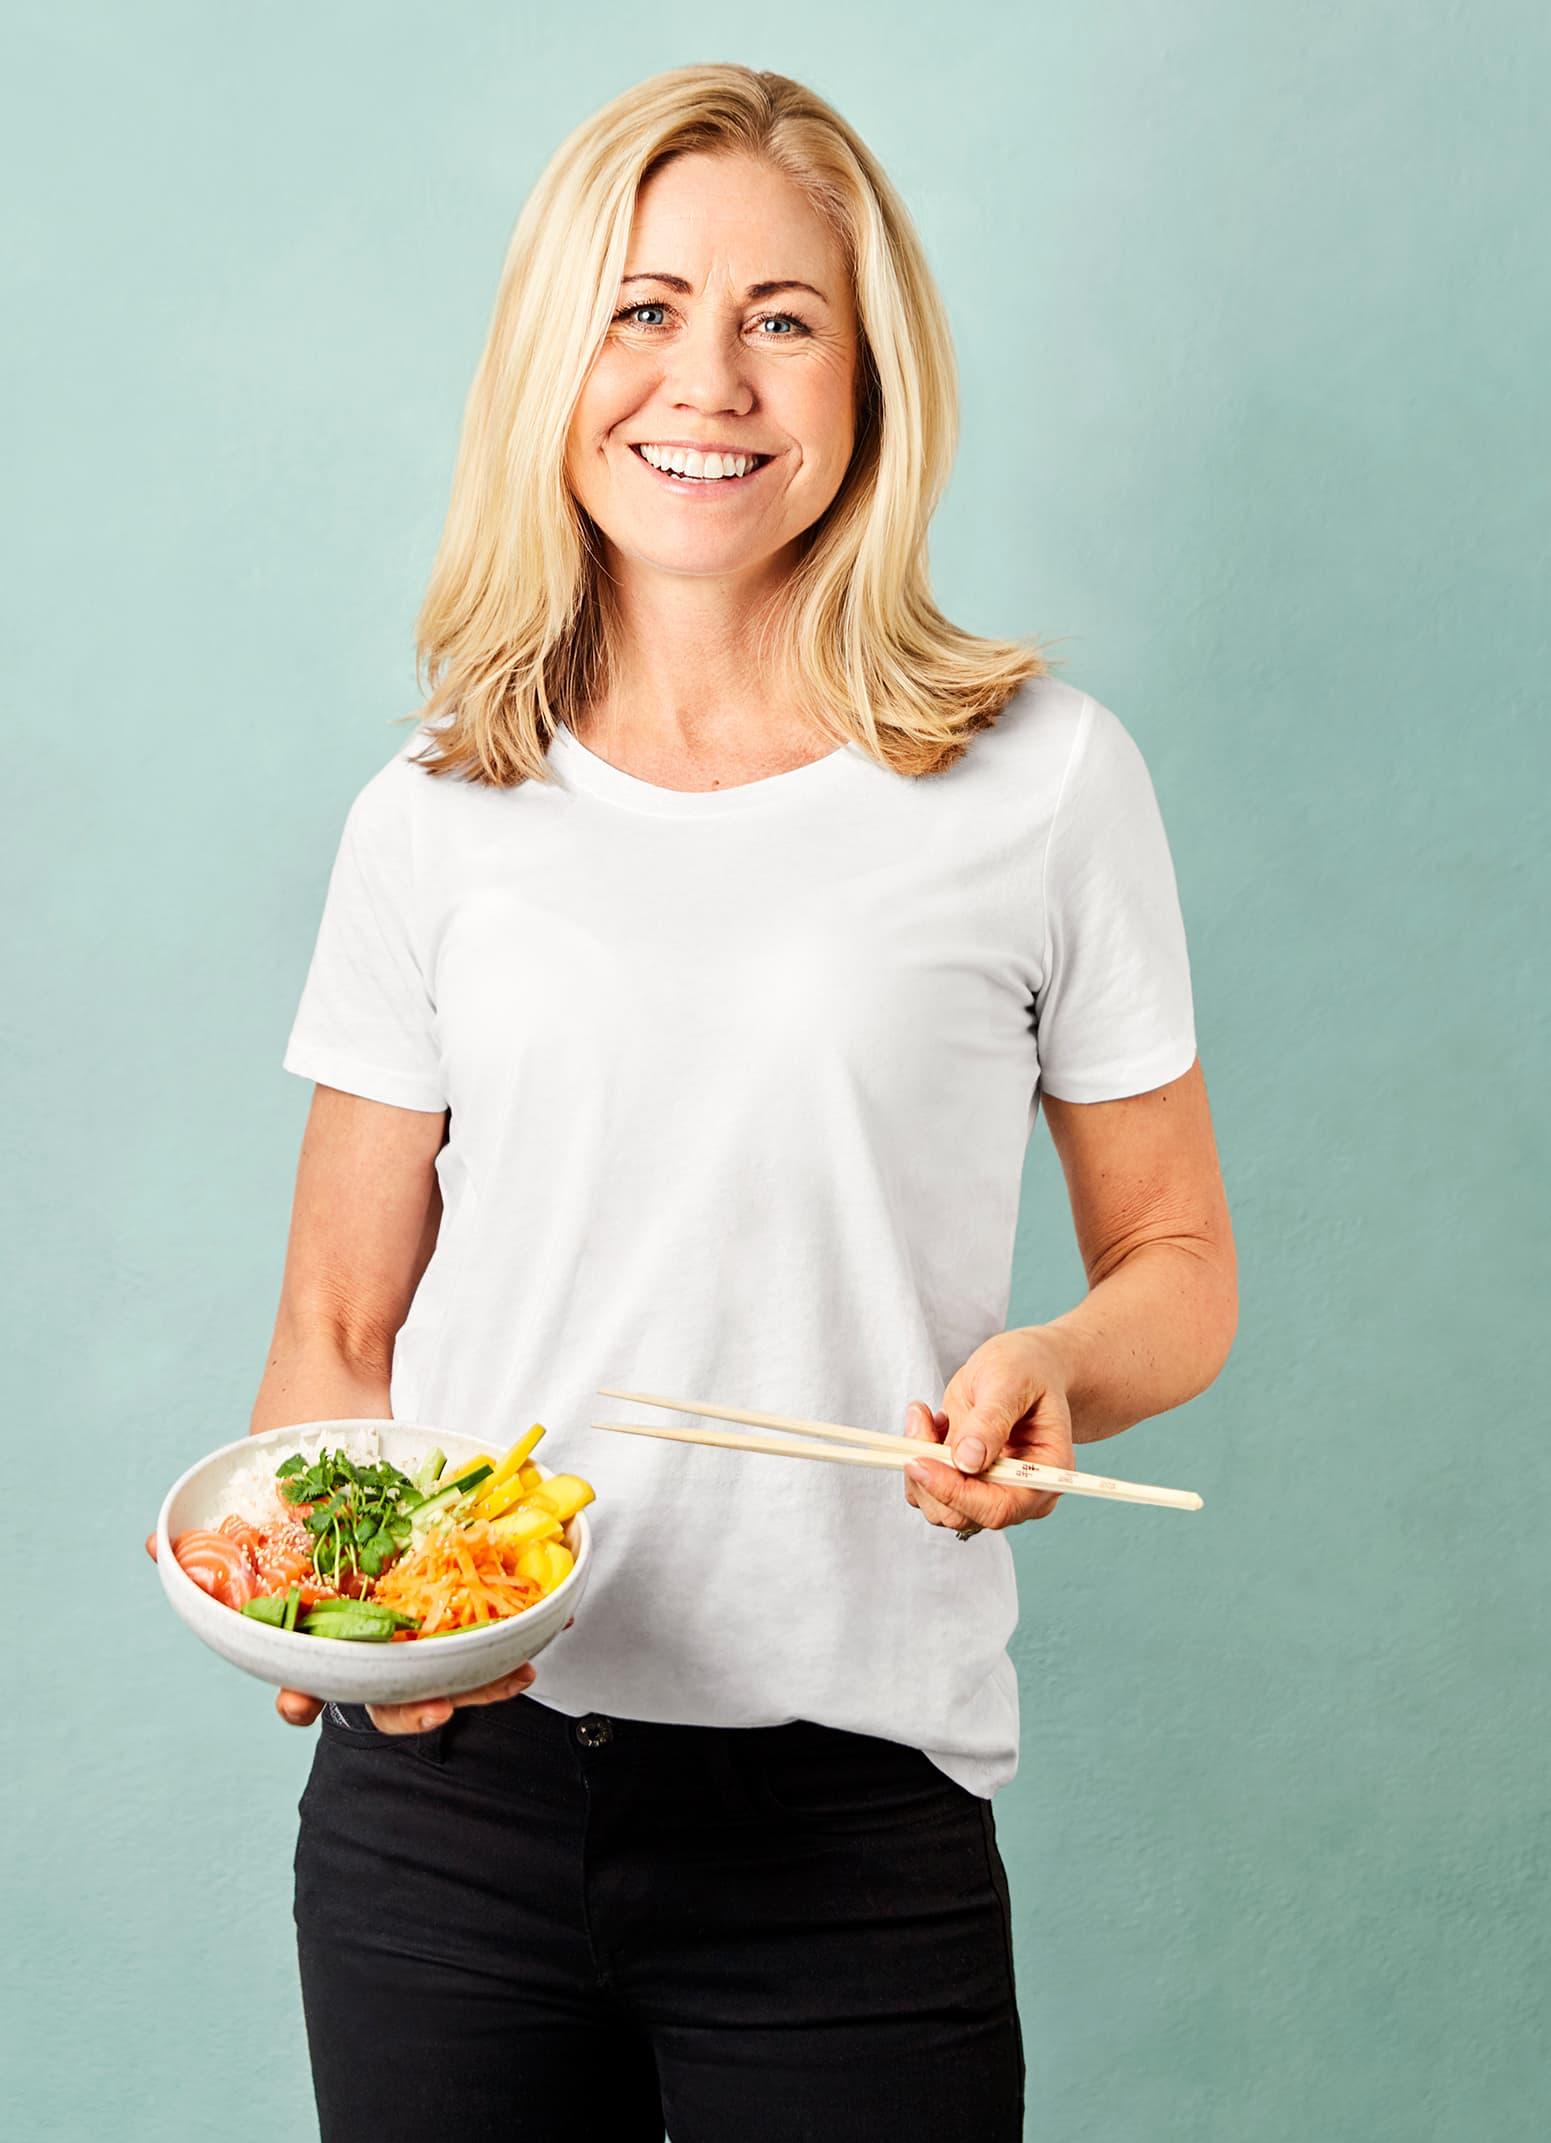 Klinisk ernæringsfysiolog Tine Sundfør er glad i fisk.